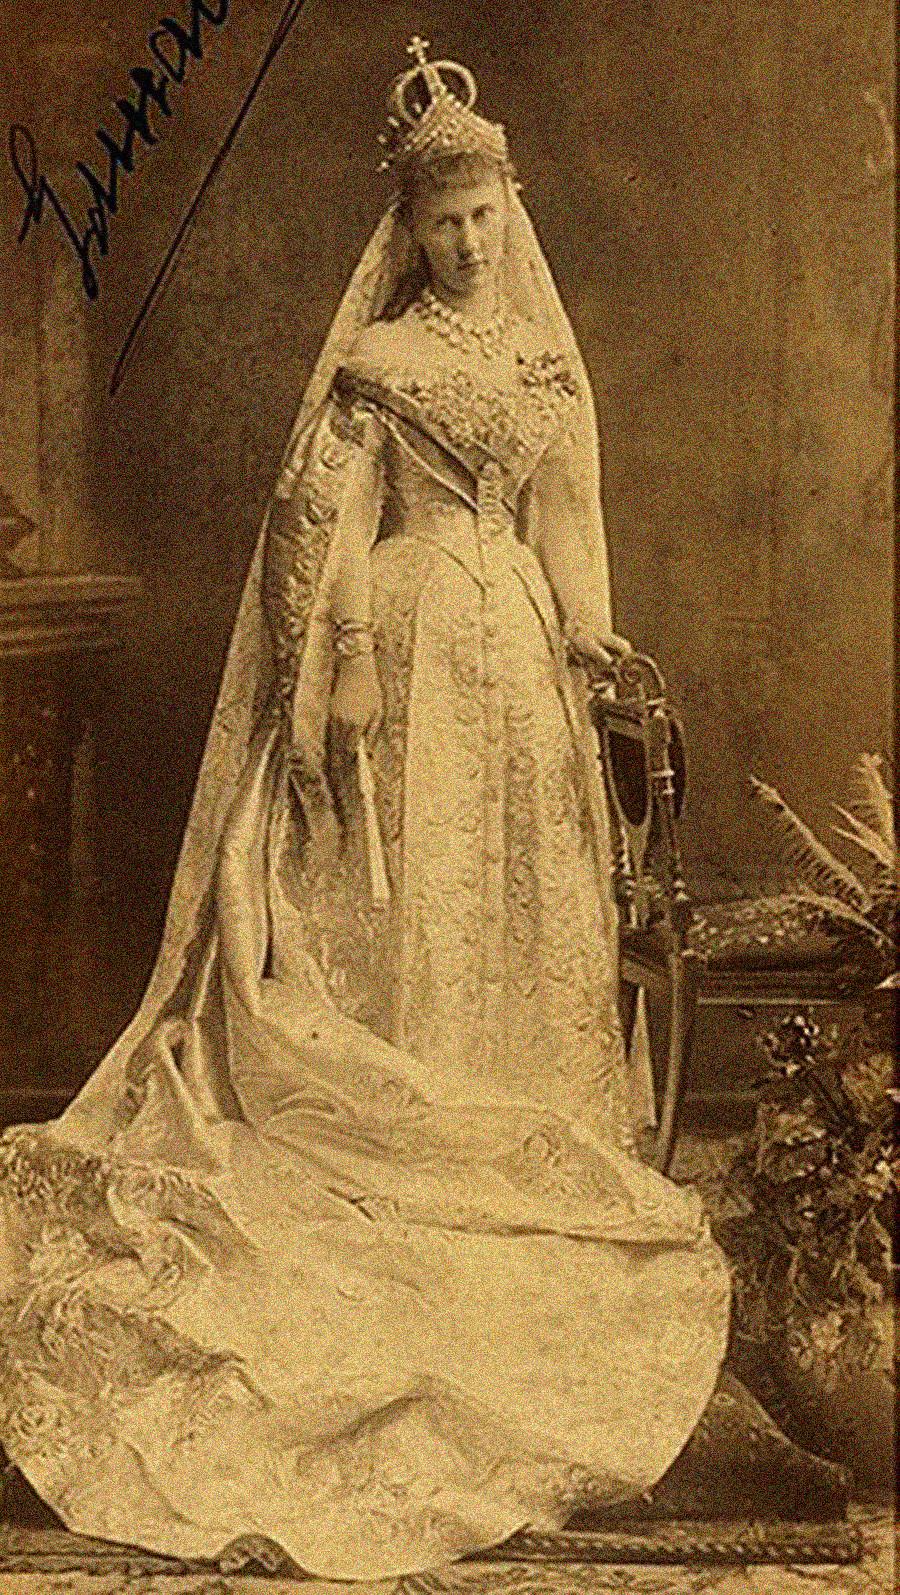 Grand Duchess Elizabeth Mavrikievna, granddaughter of Nicholas I, in the wedding dress, 1884.